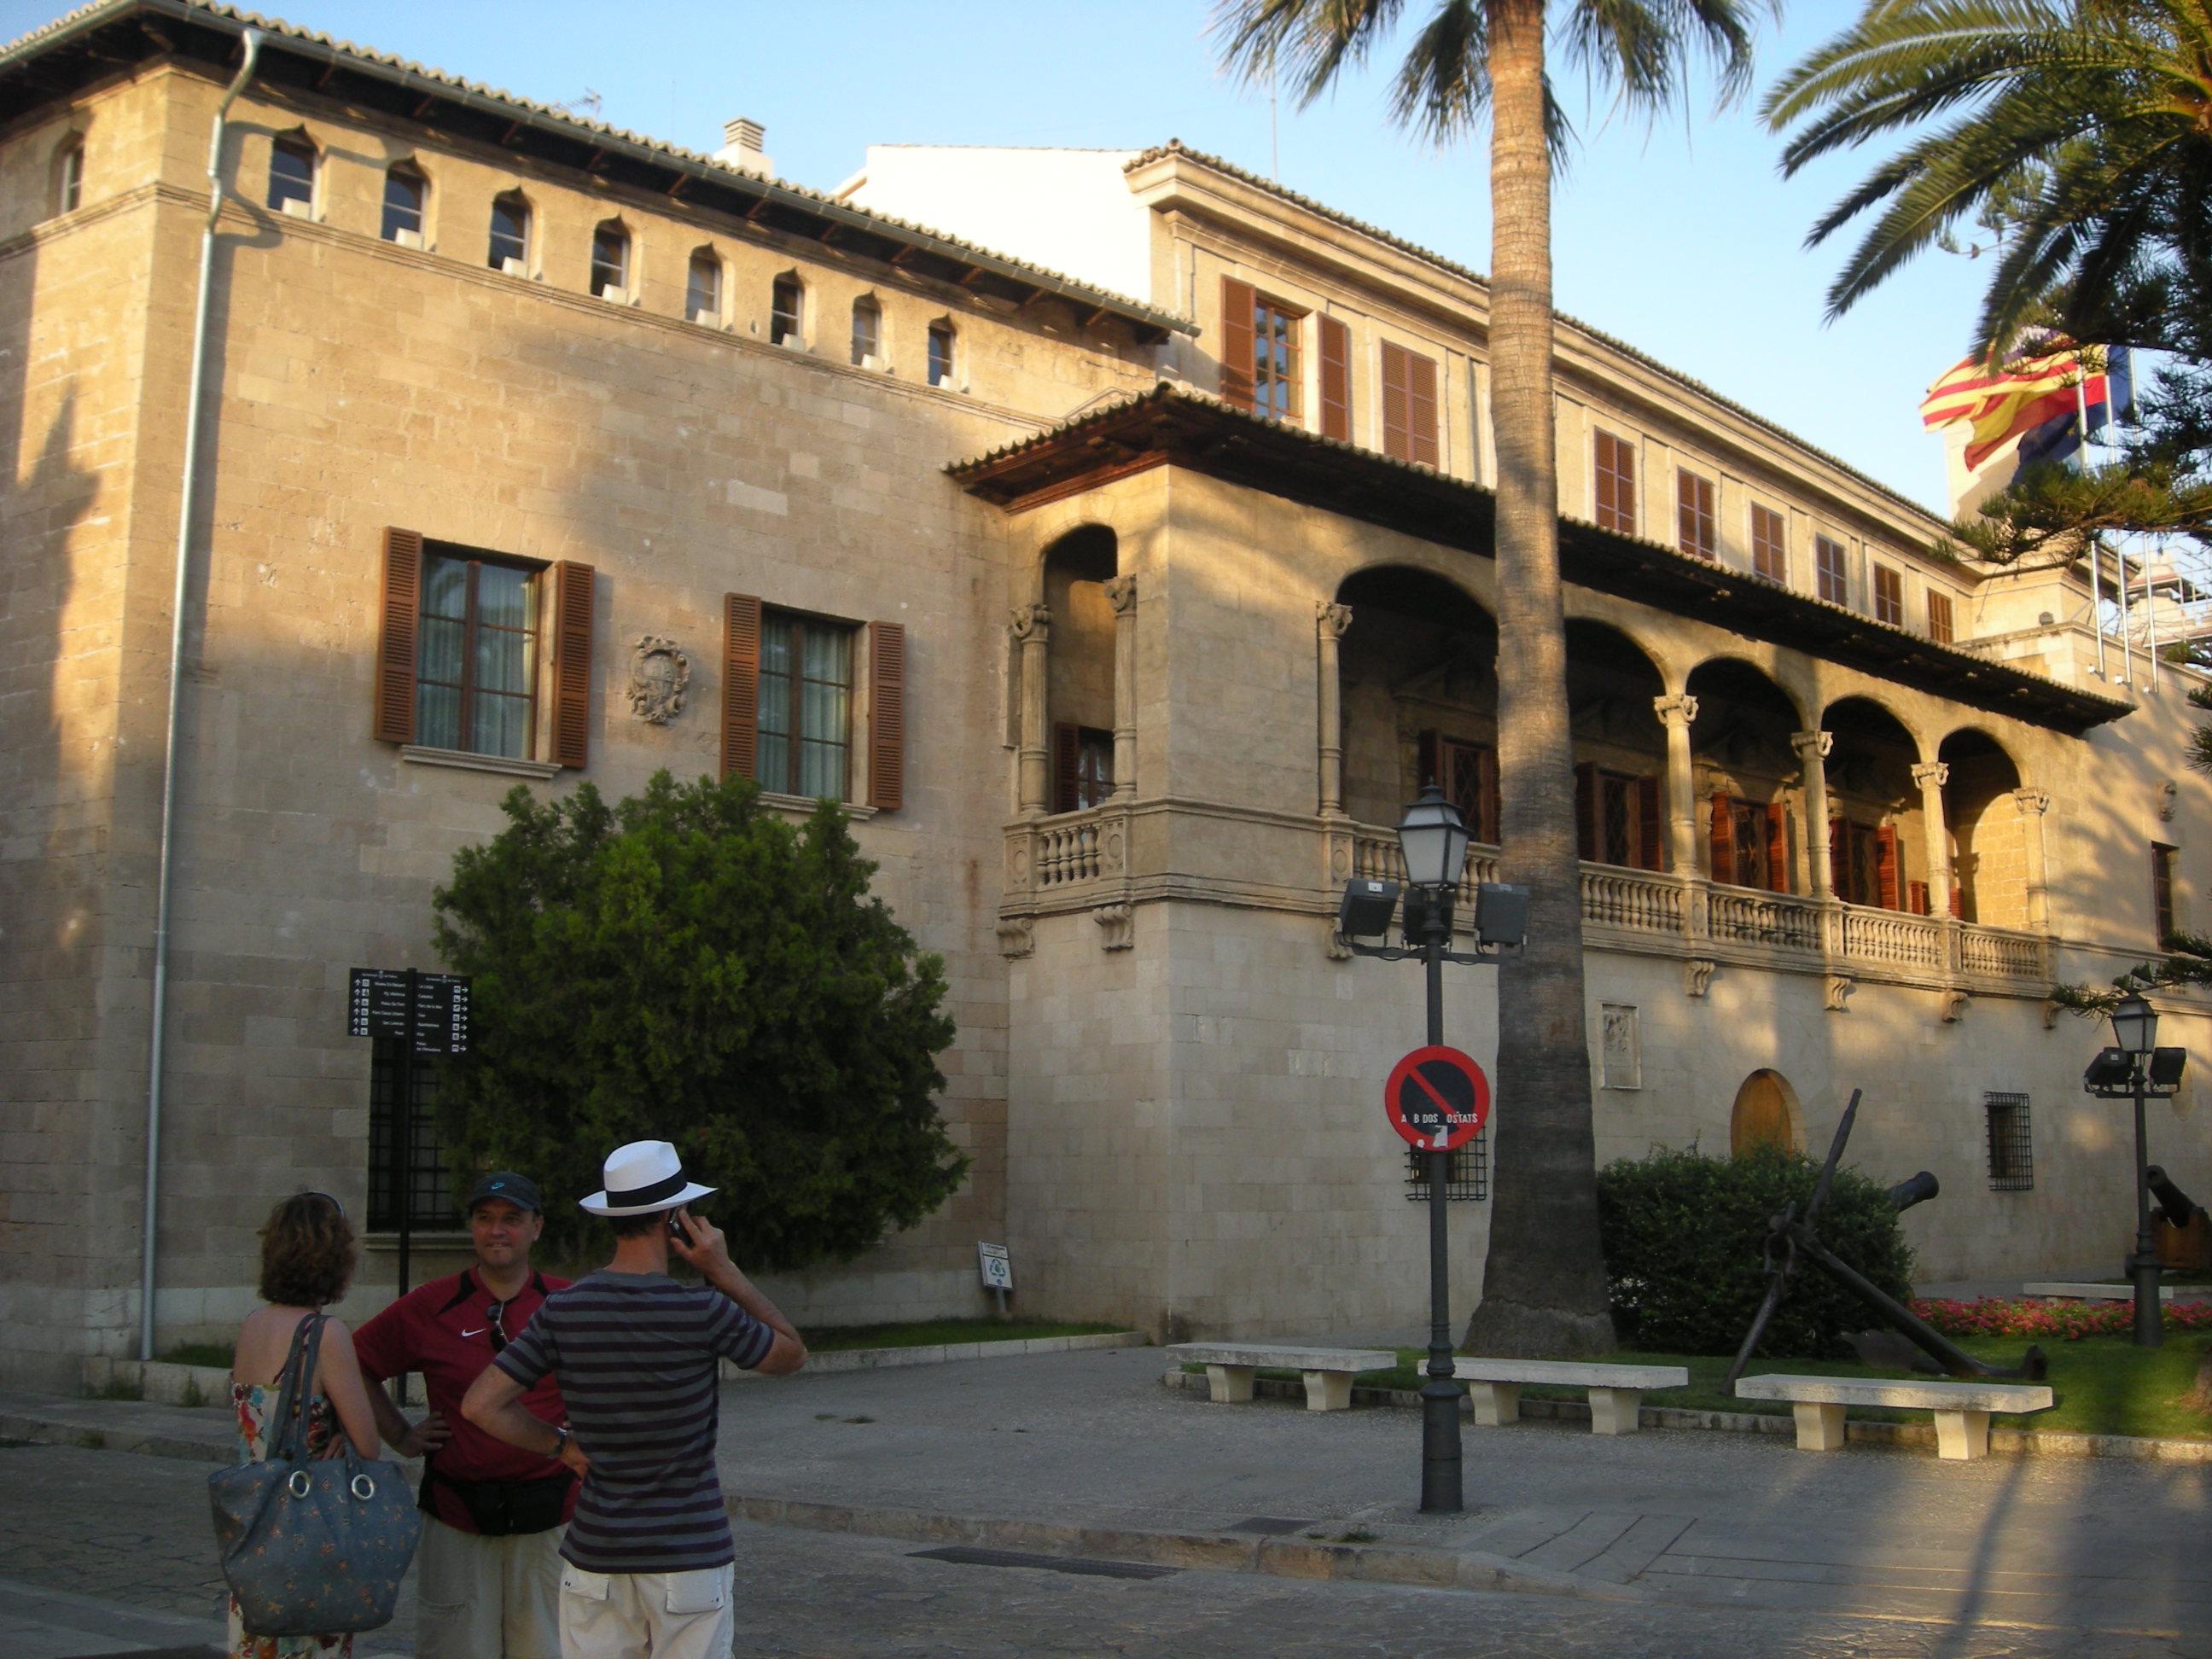 Consulado del Mar (Mallorca) - Wikipedia, la enciclopedia libre